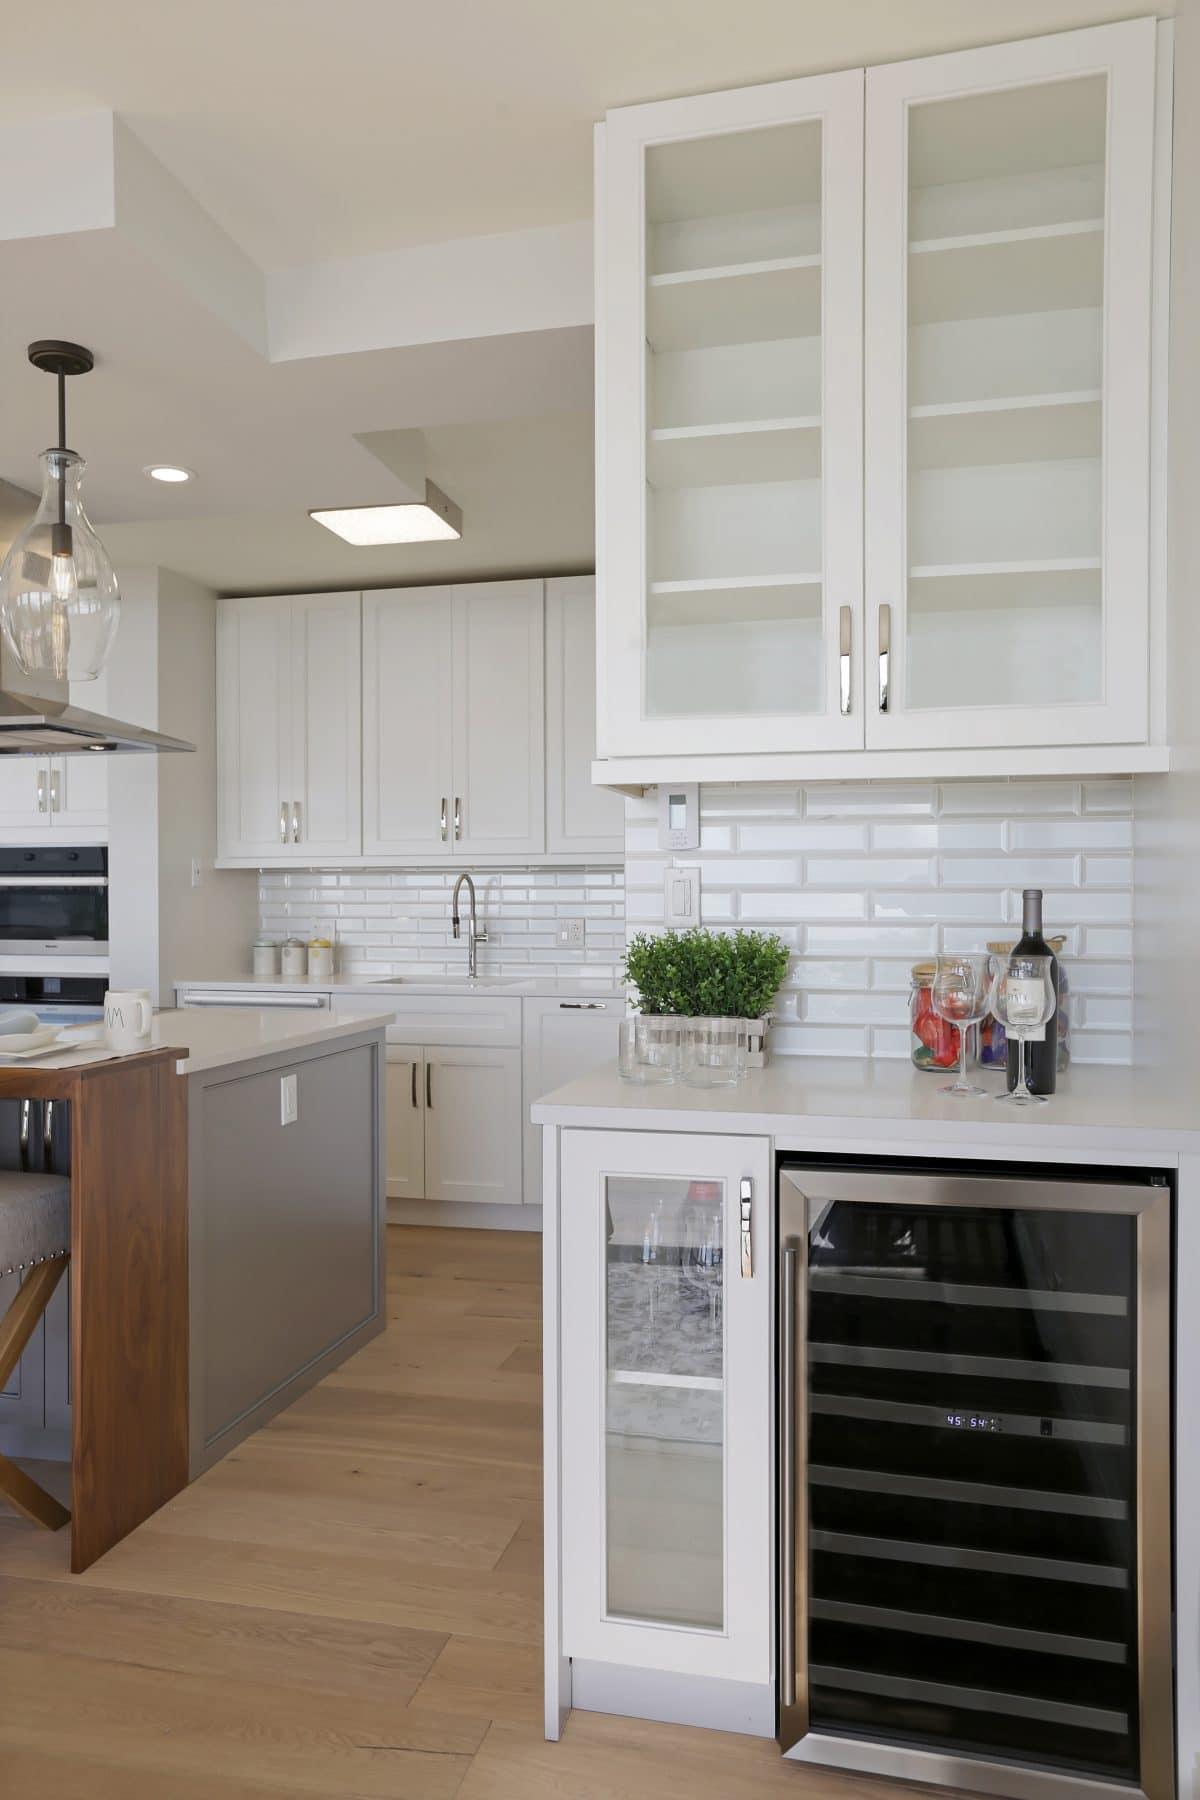 Floor to ceiling storage cabinets - Floor To Ceiling Kitchen Cabinets Wine Storage Cabinets